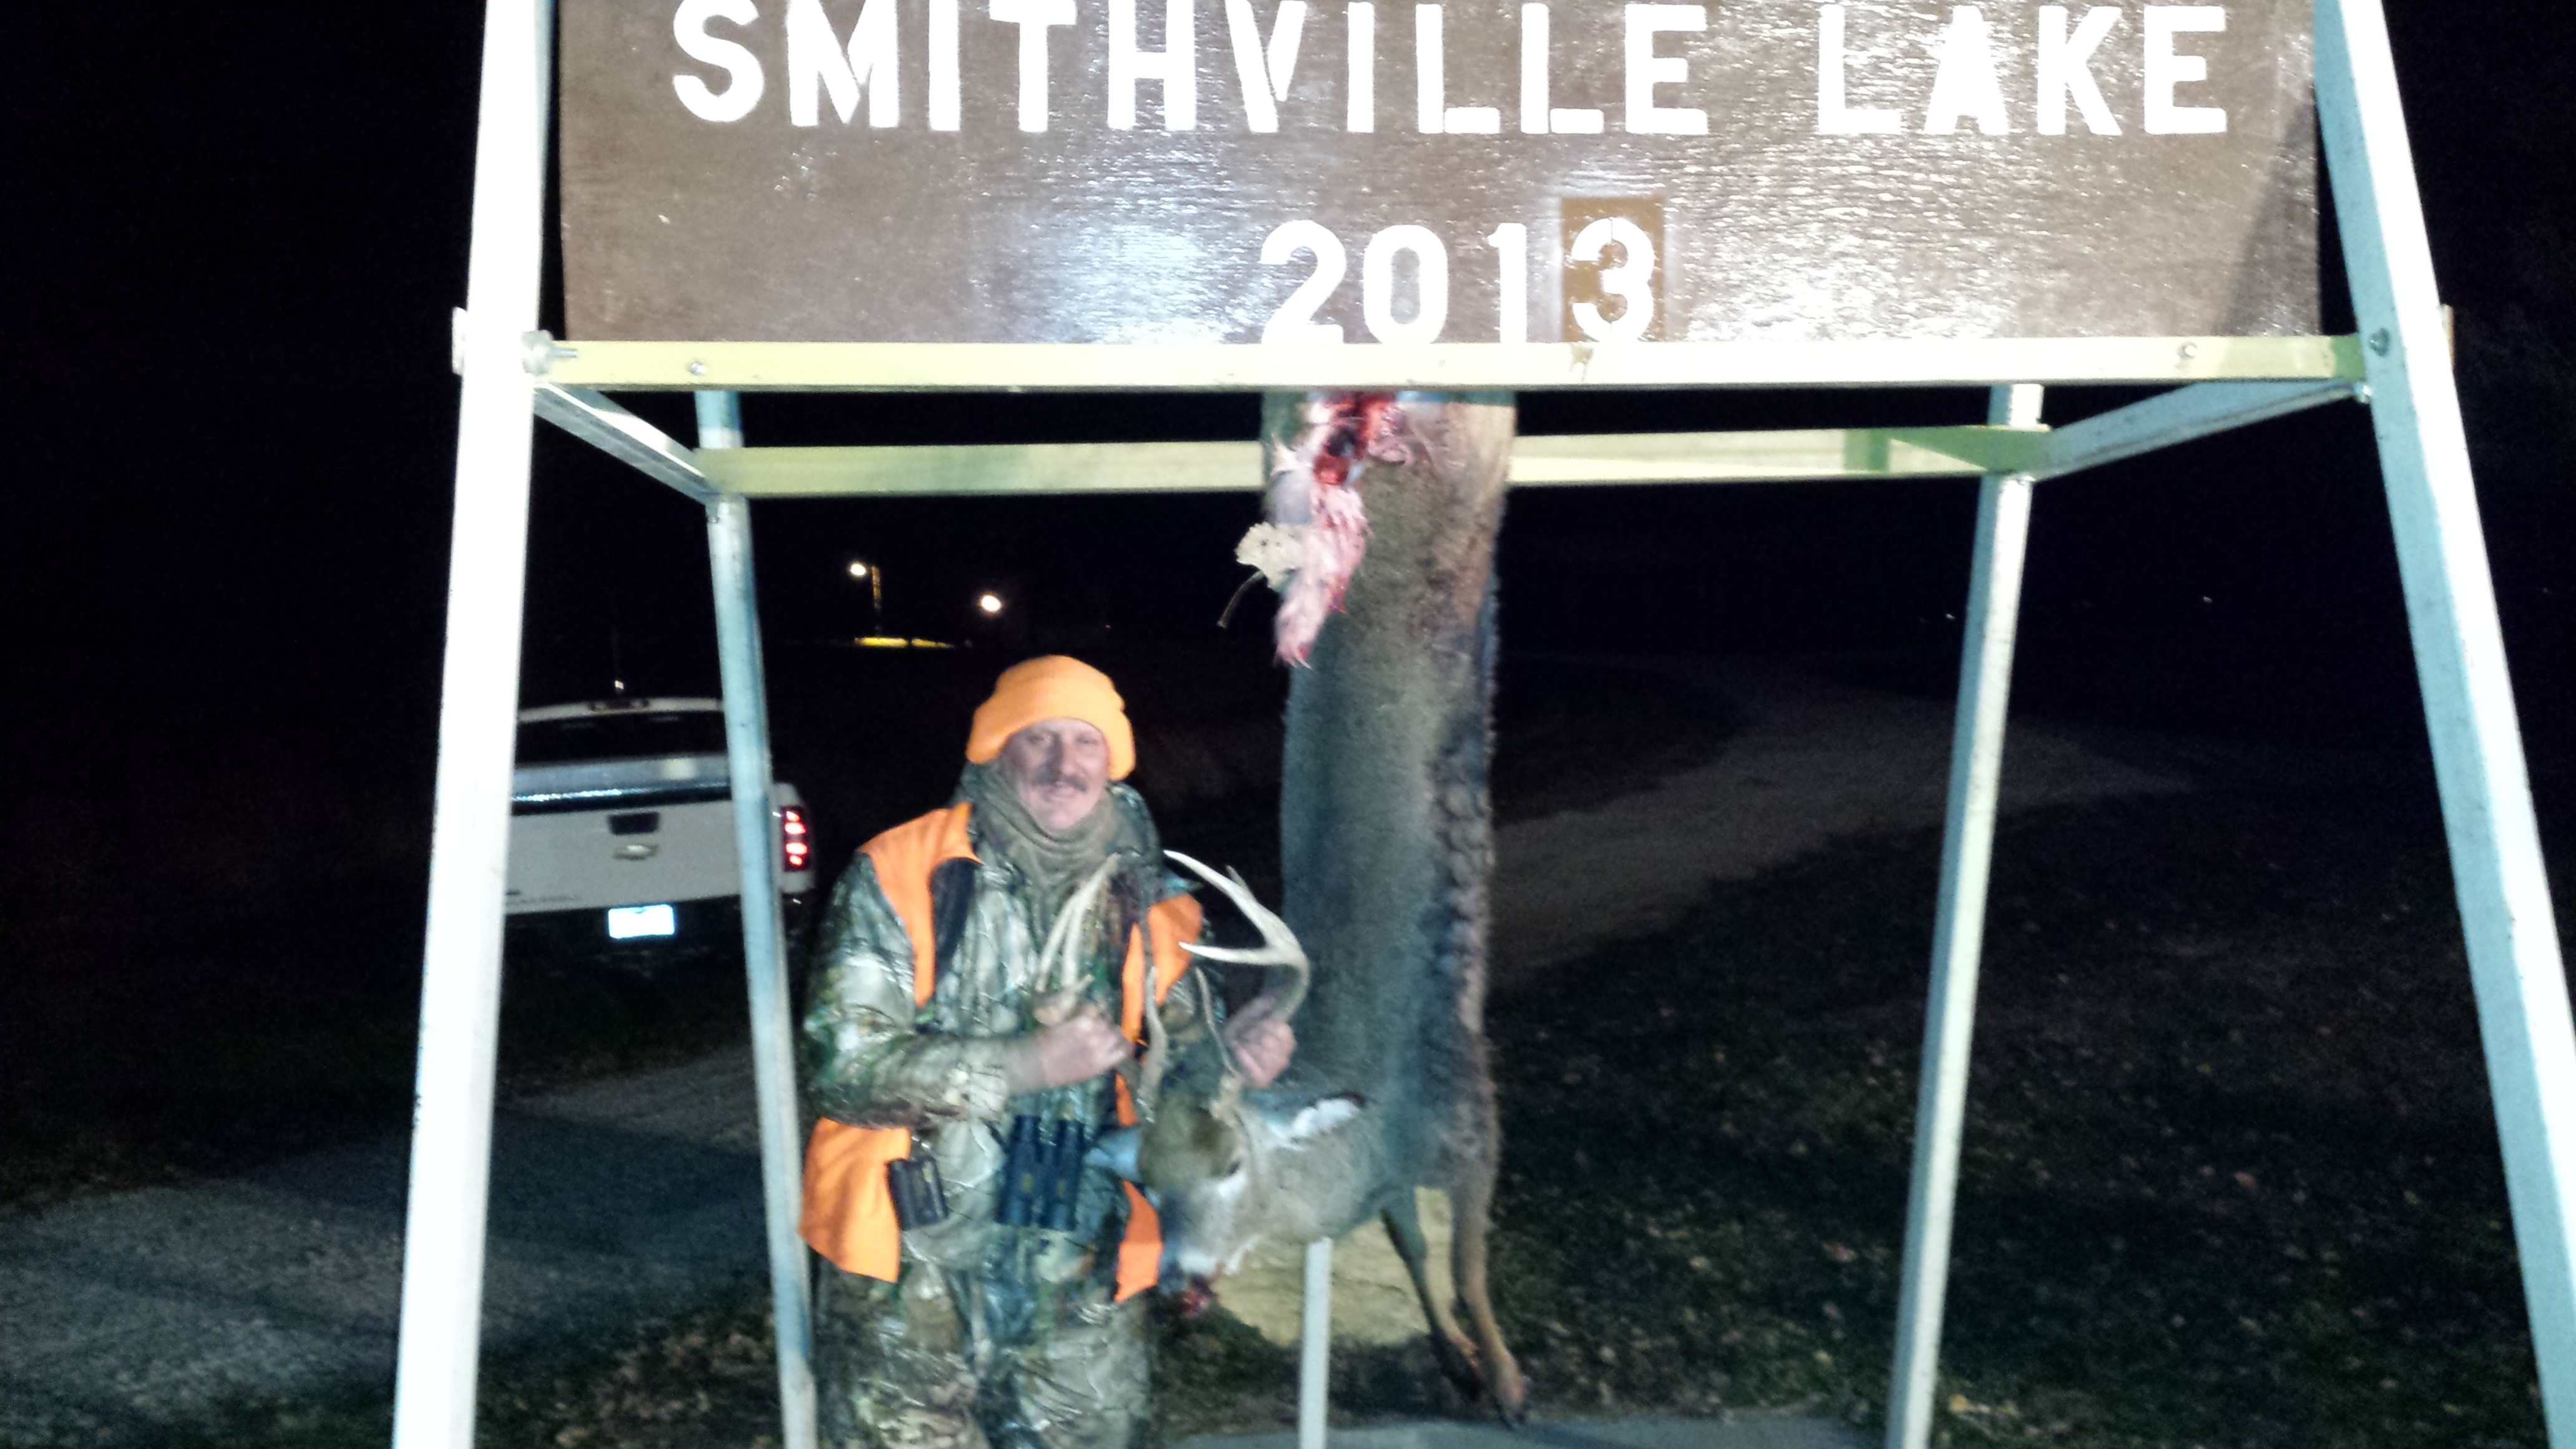 Smithville 2013 (4)